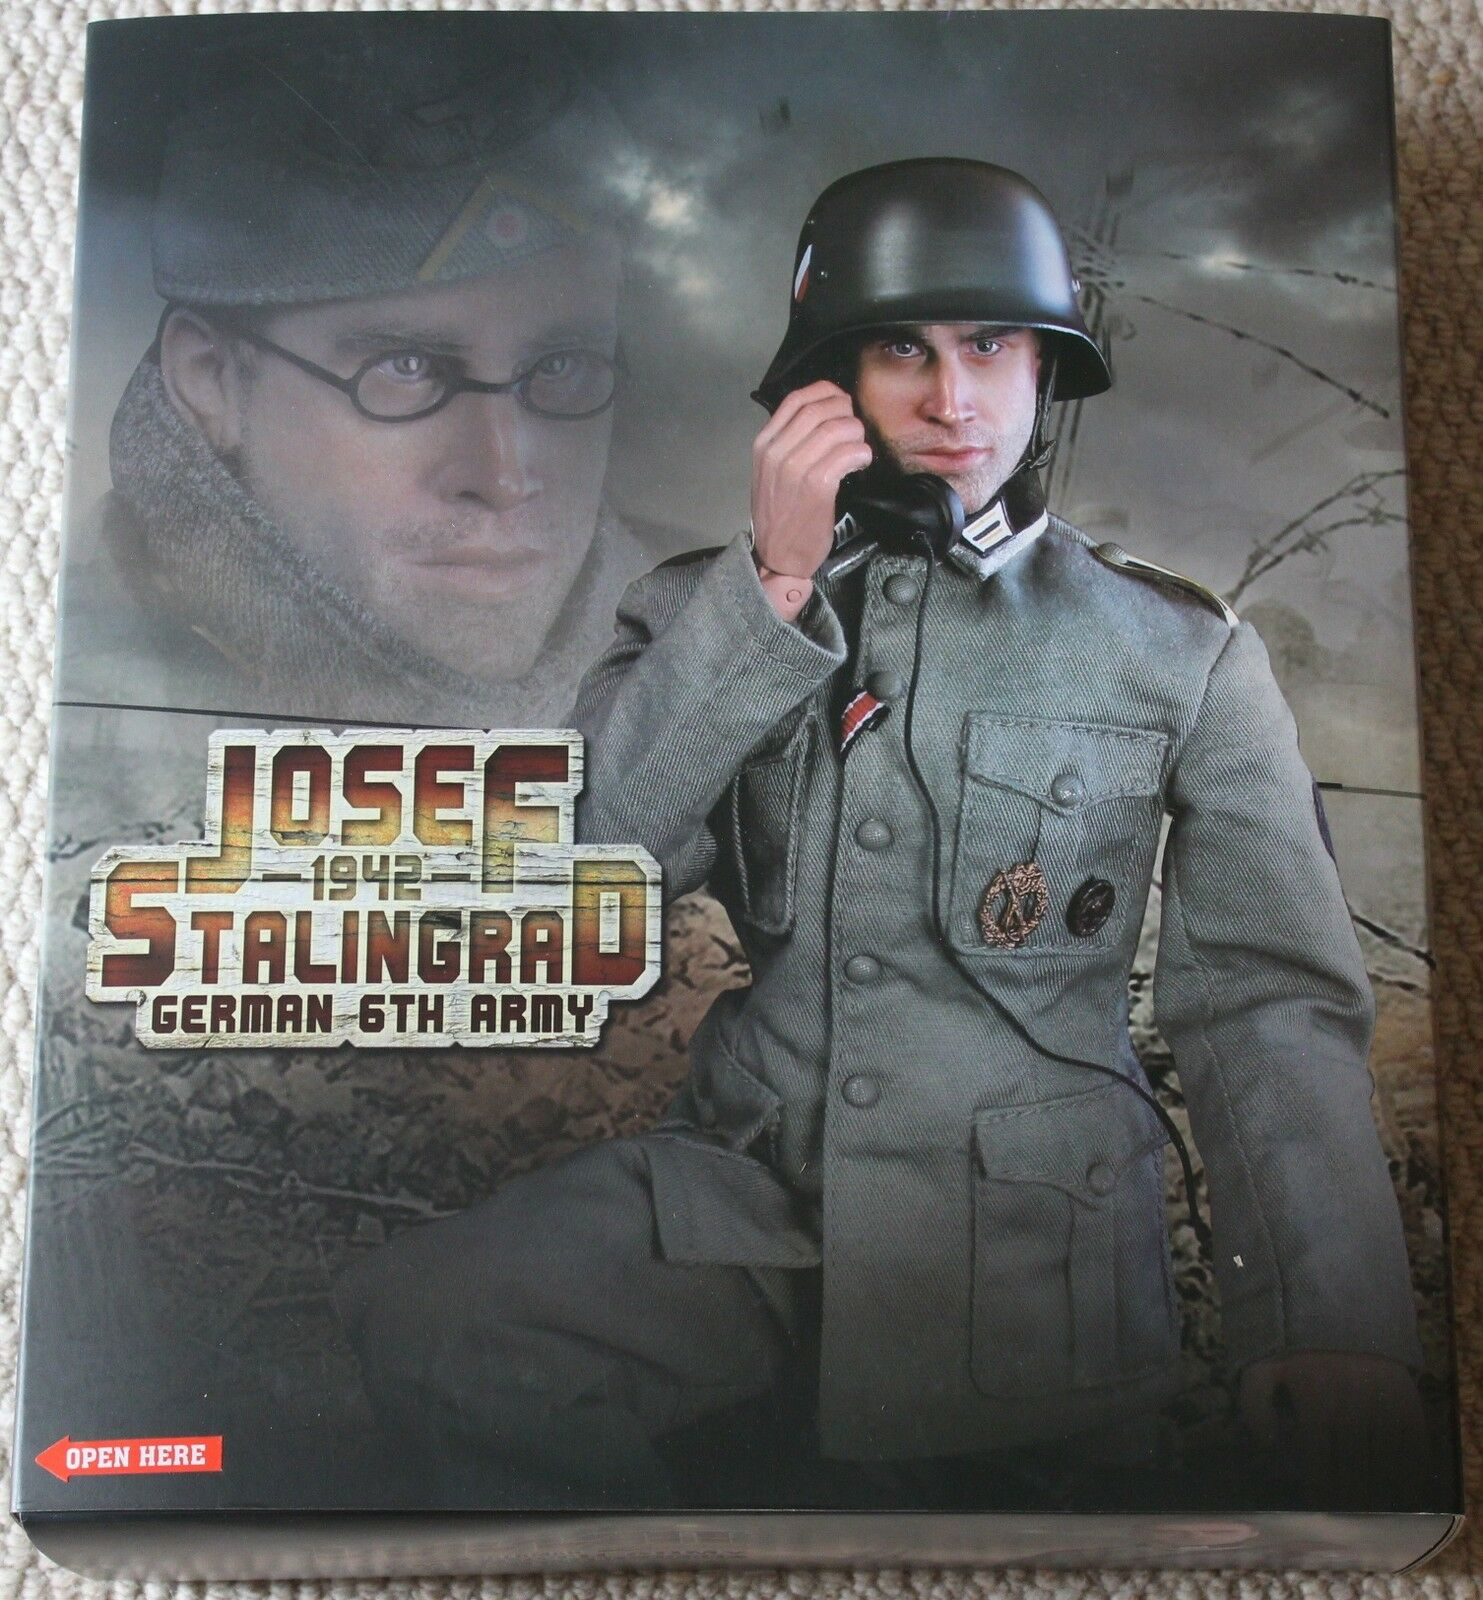 DID Action Figure tedesco Josef starlingrad 1 6 12  in scatola Hot Toy ww11 Dragon